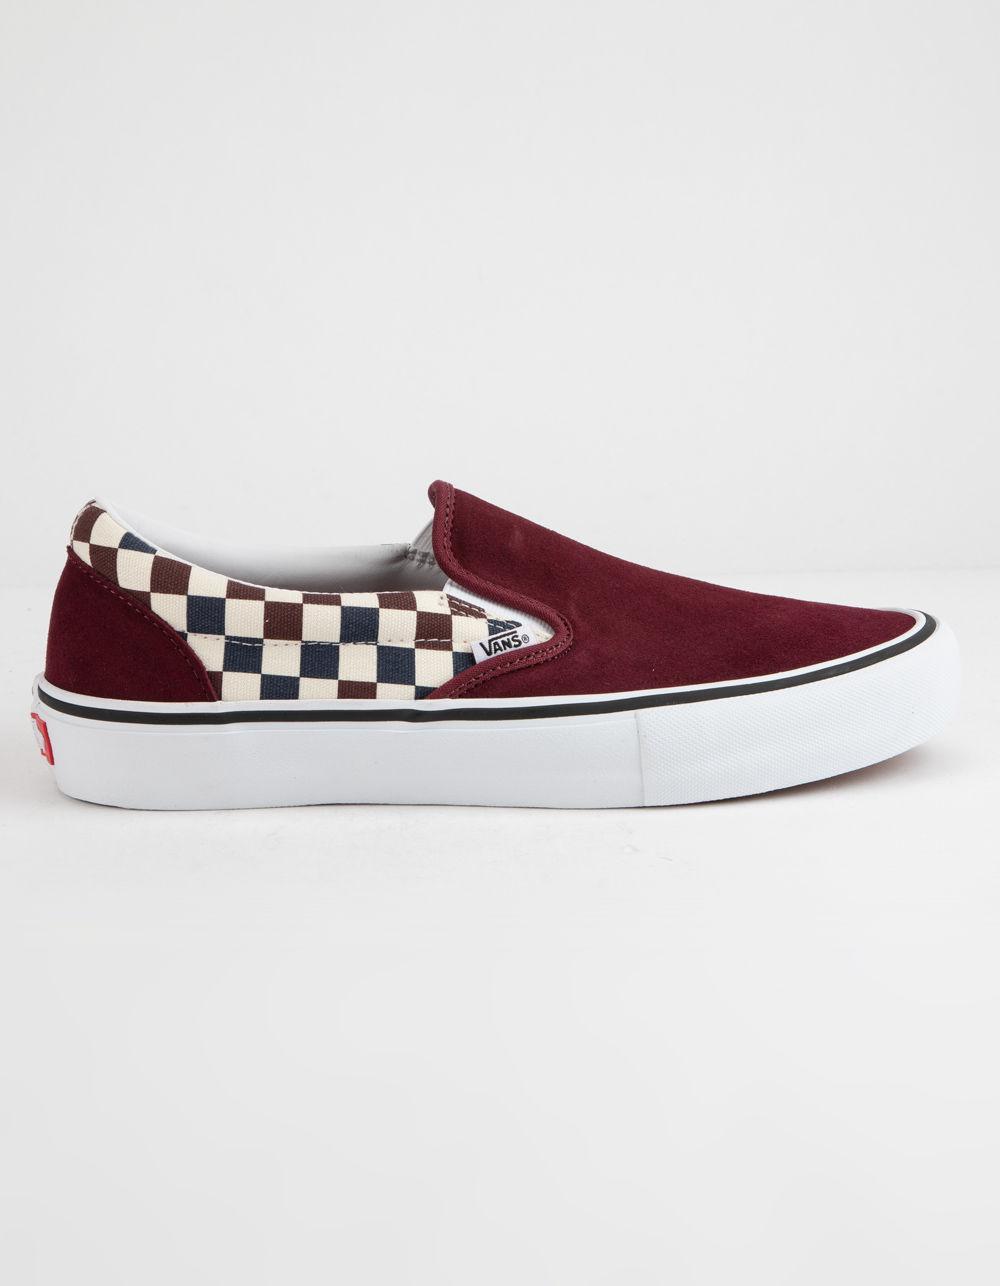 43026ccd52b8ef Vans - Red Checkerboard Slip-on Pro Port Royal Royal Shoes - Lyst. View  fullscreen